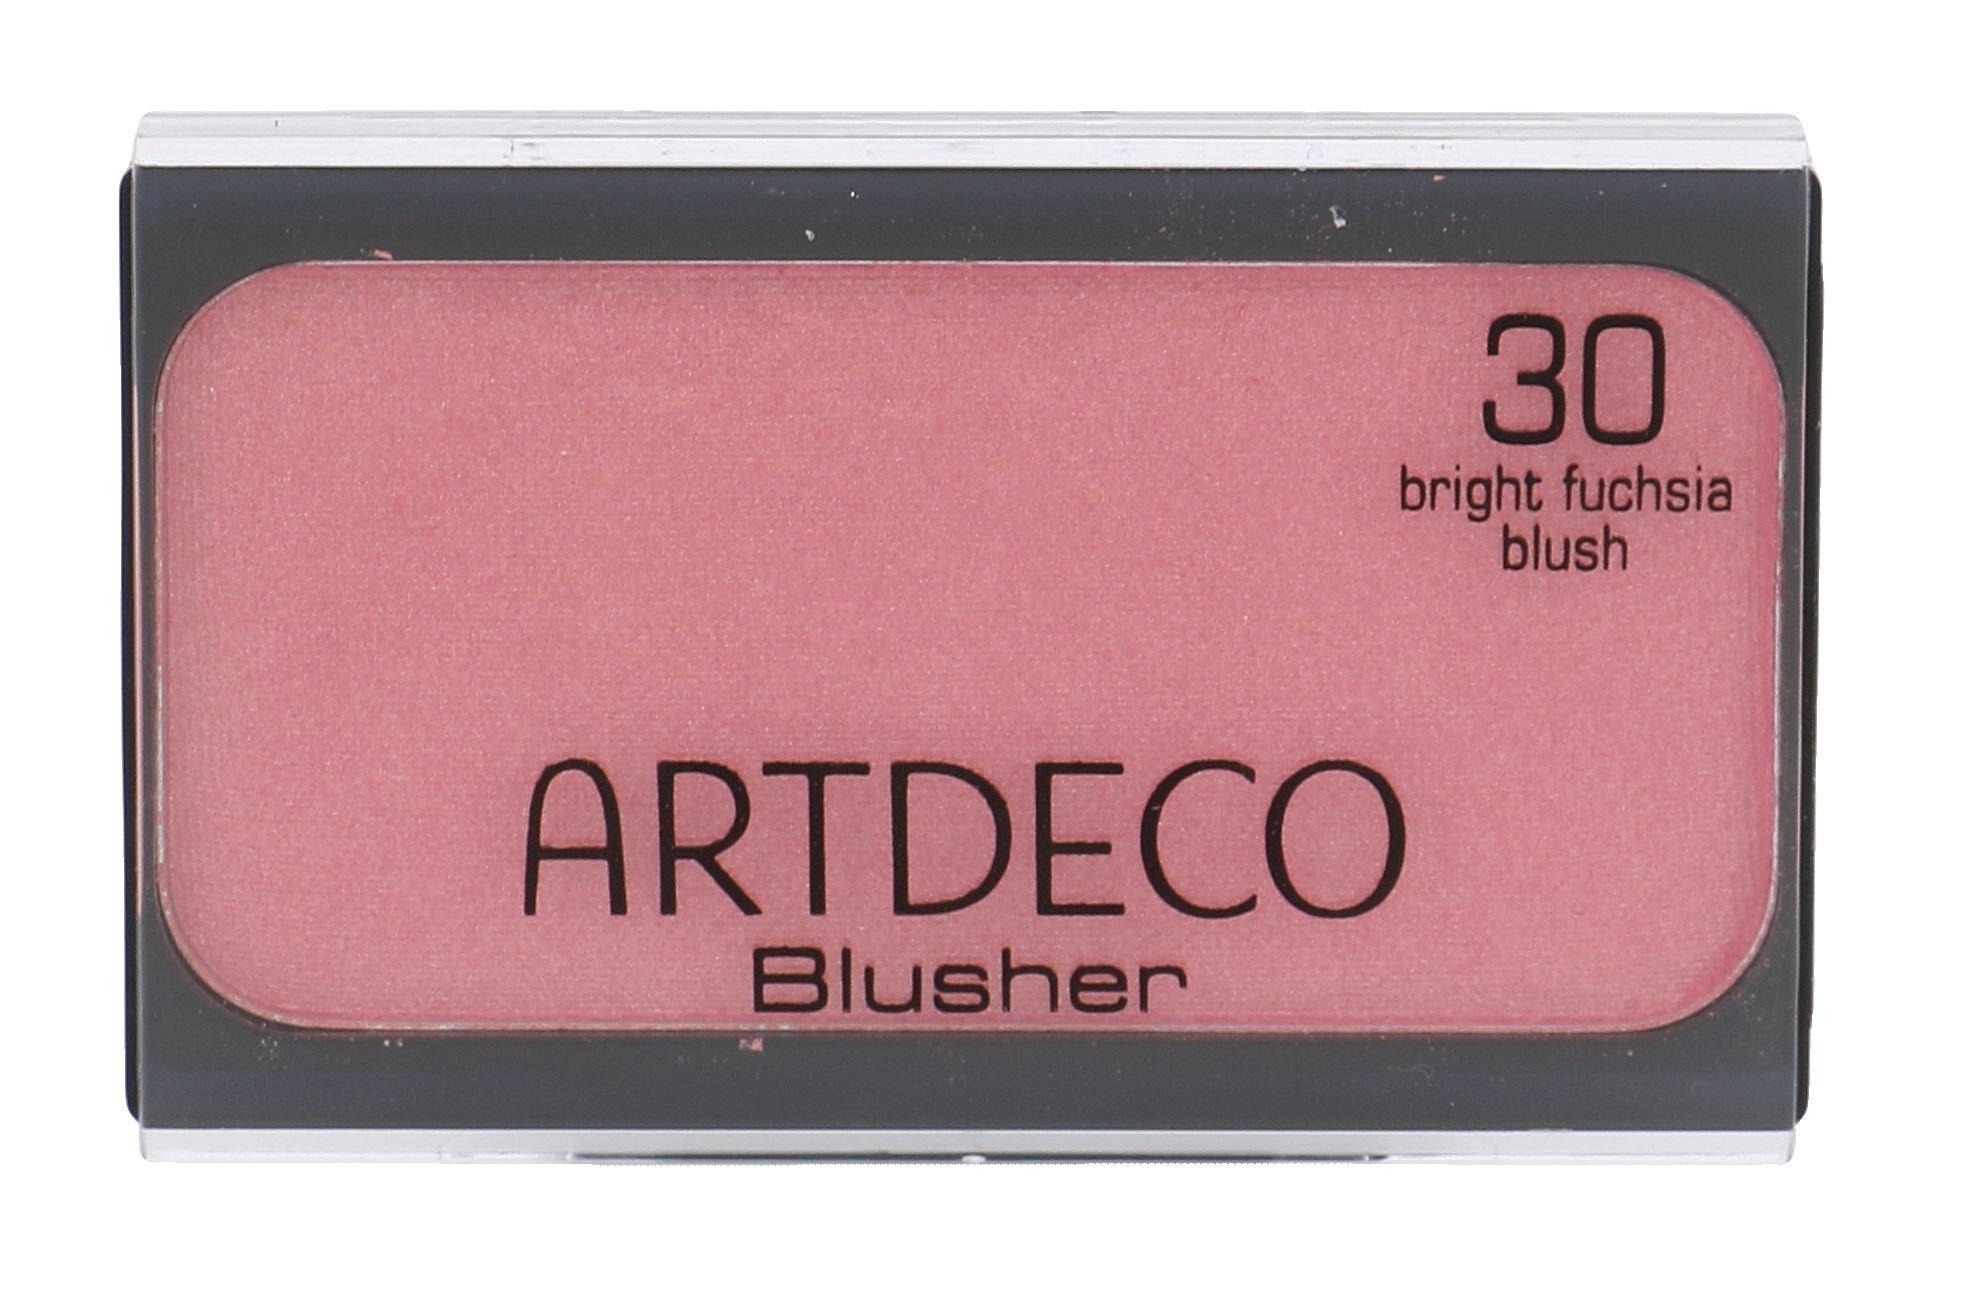 Artdeco Blusher Cosmetic 5ml 30 Bright Fuchsia Blush